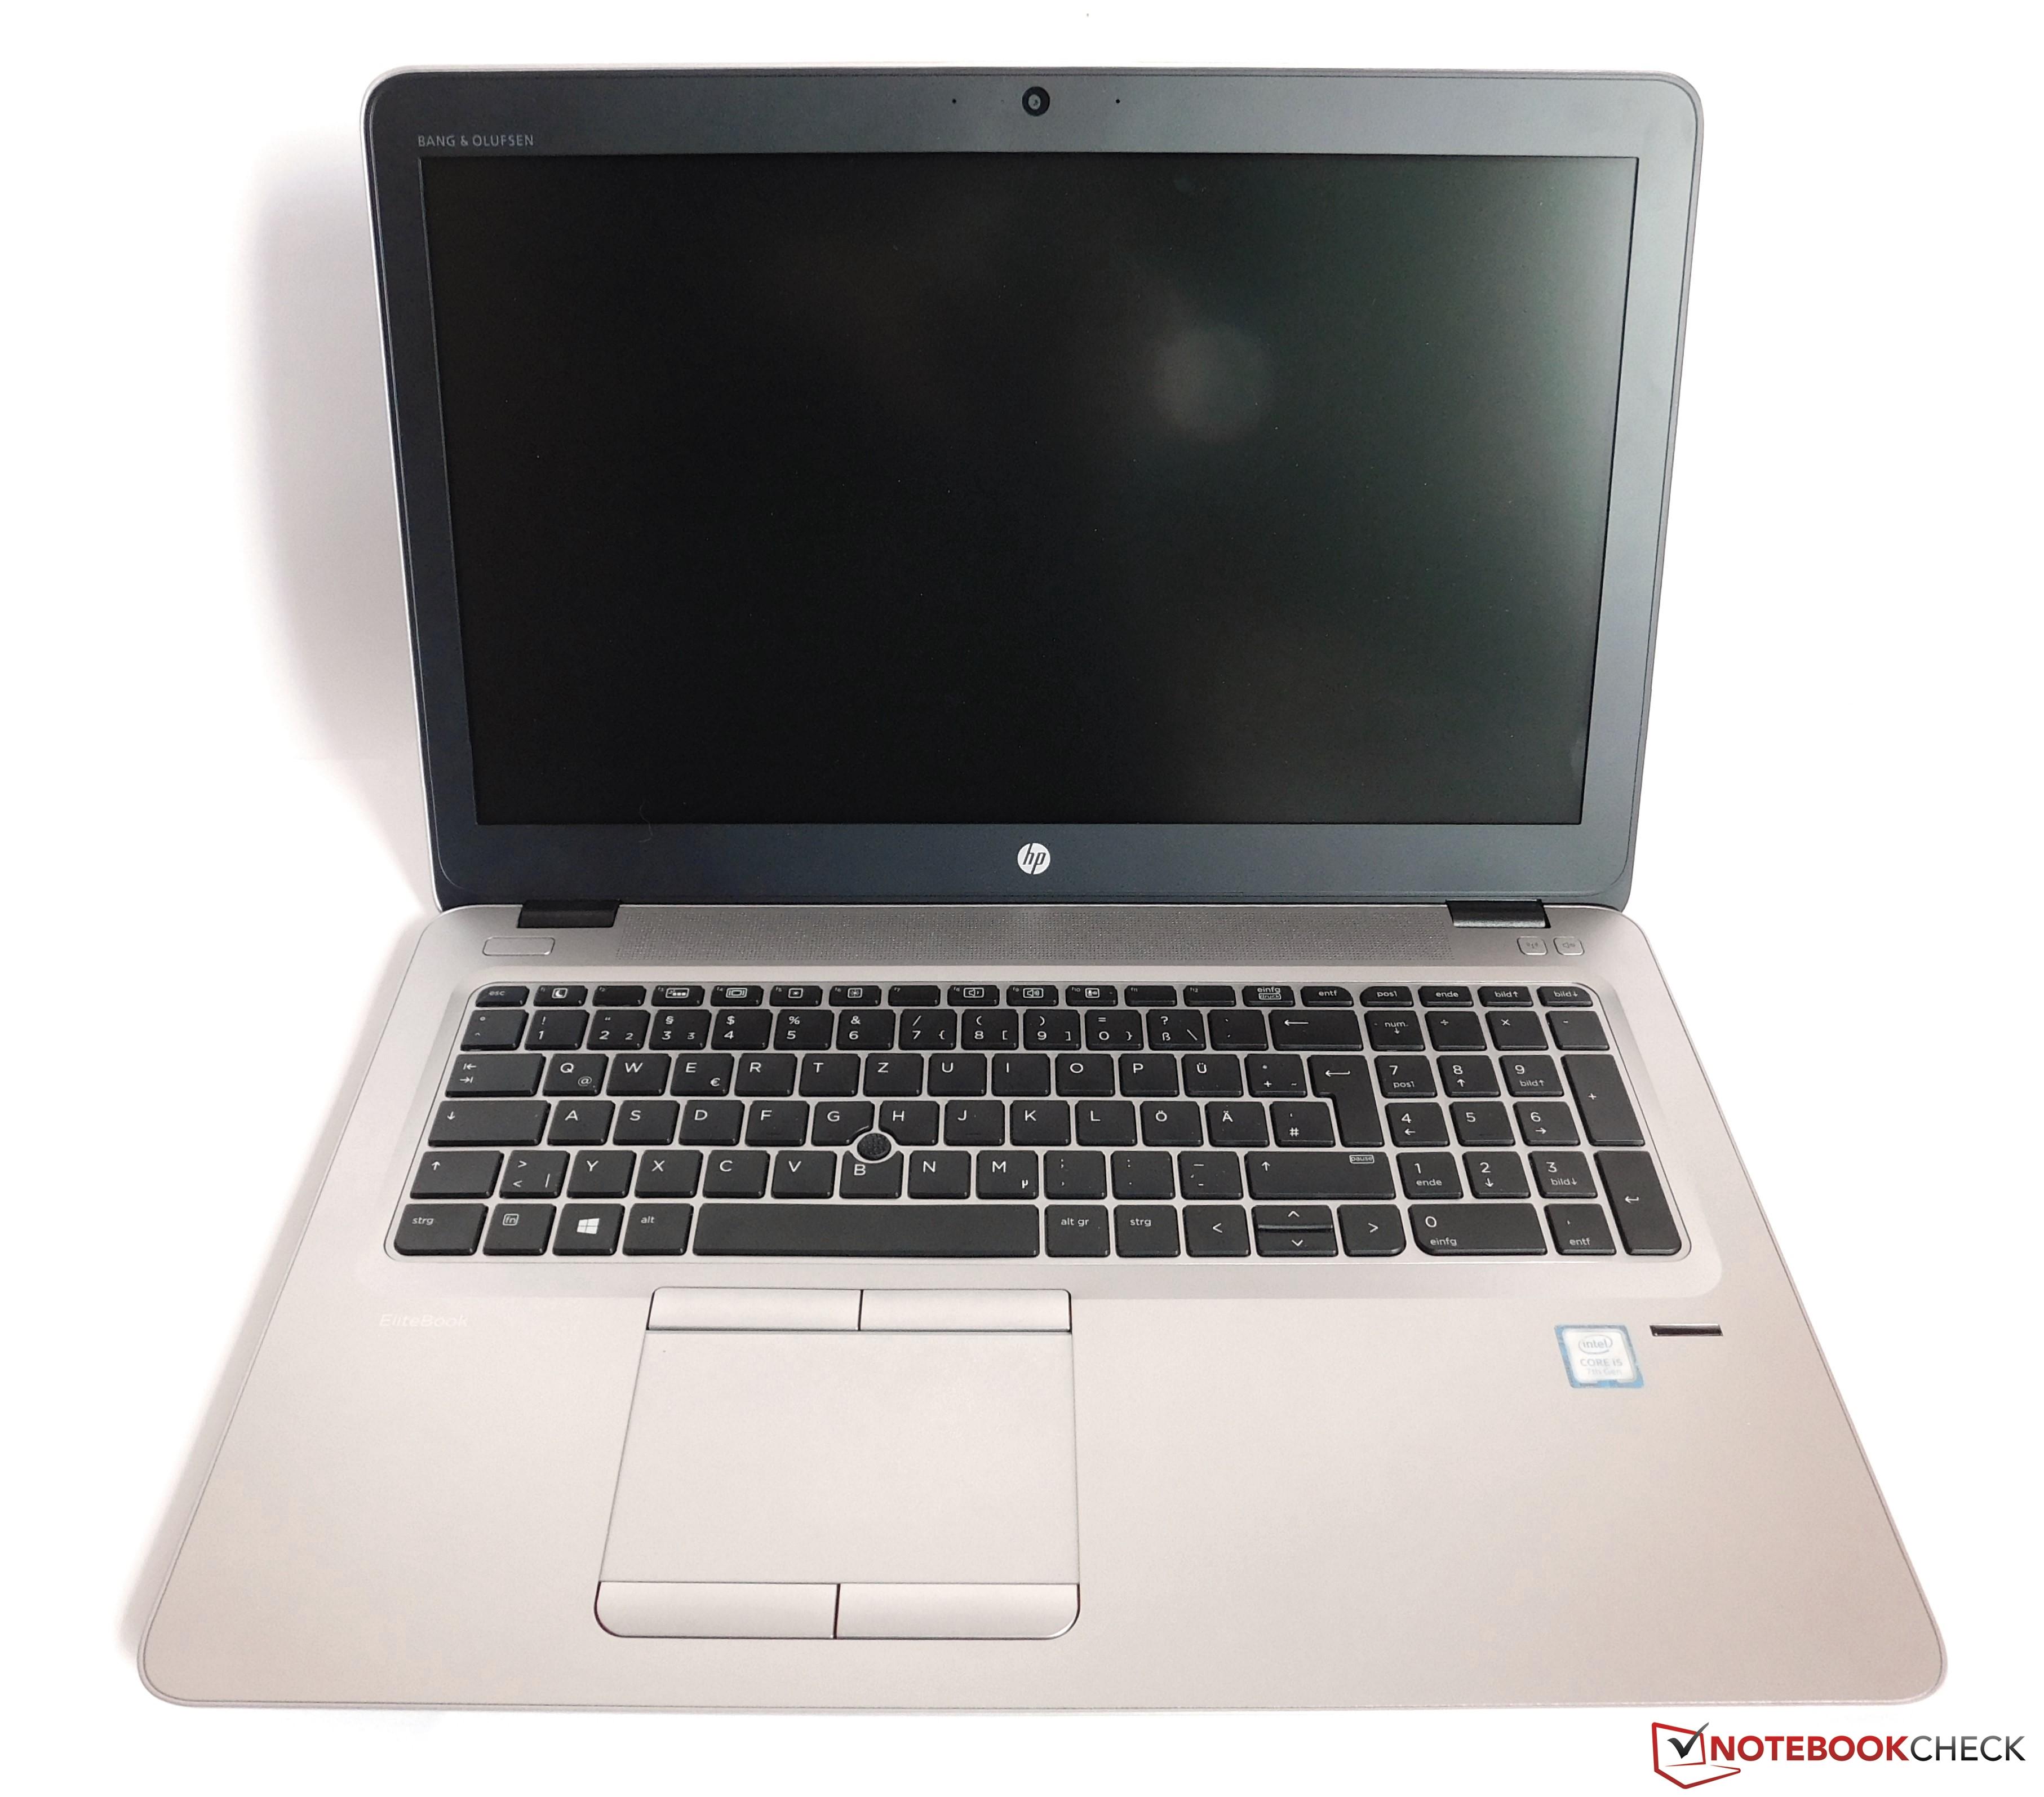 HP EliteBook 850 G4 (Core i5, Full HD) Laptop Review - NotebookCheck ... 5a9f825b4f34